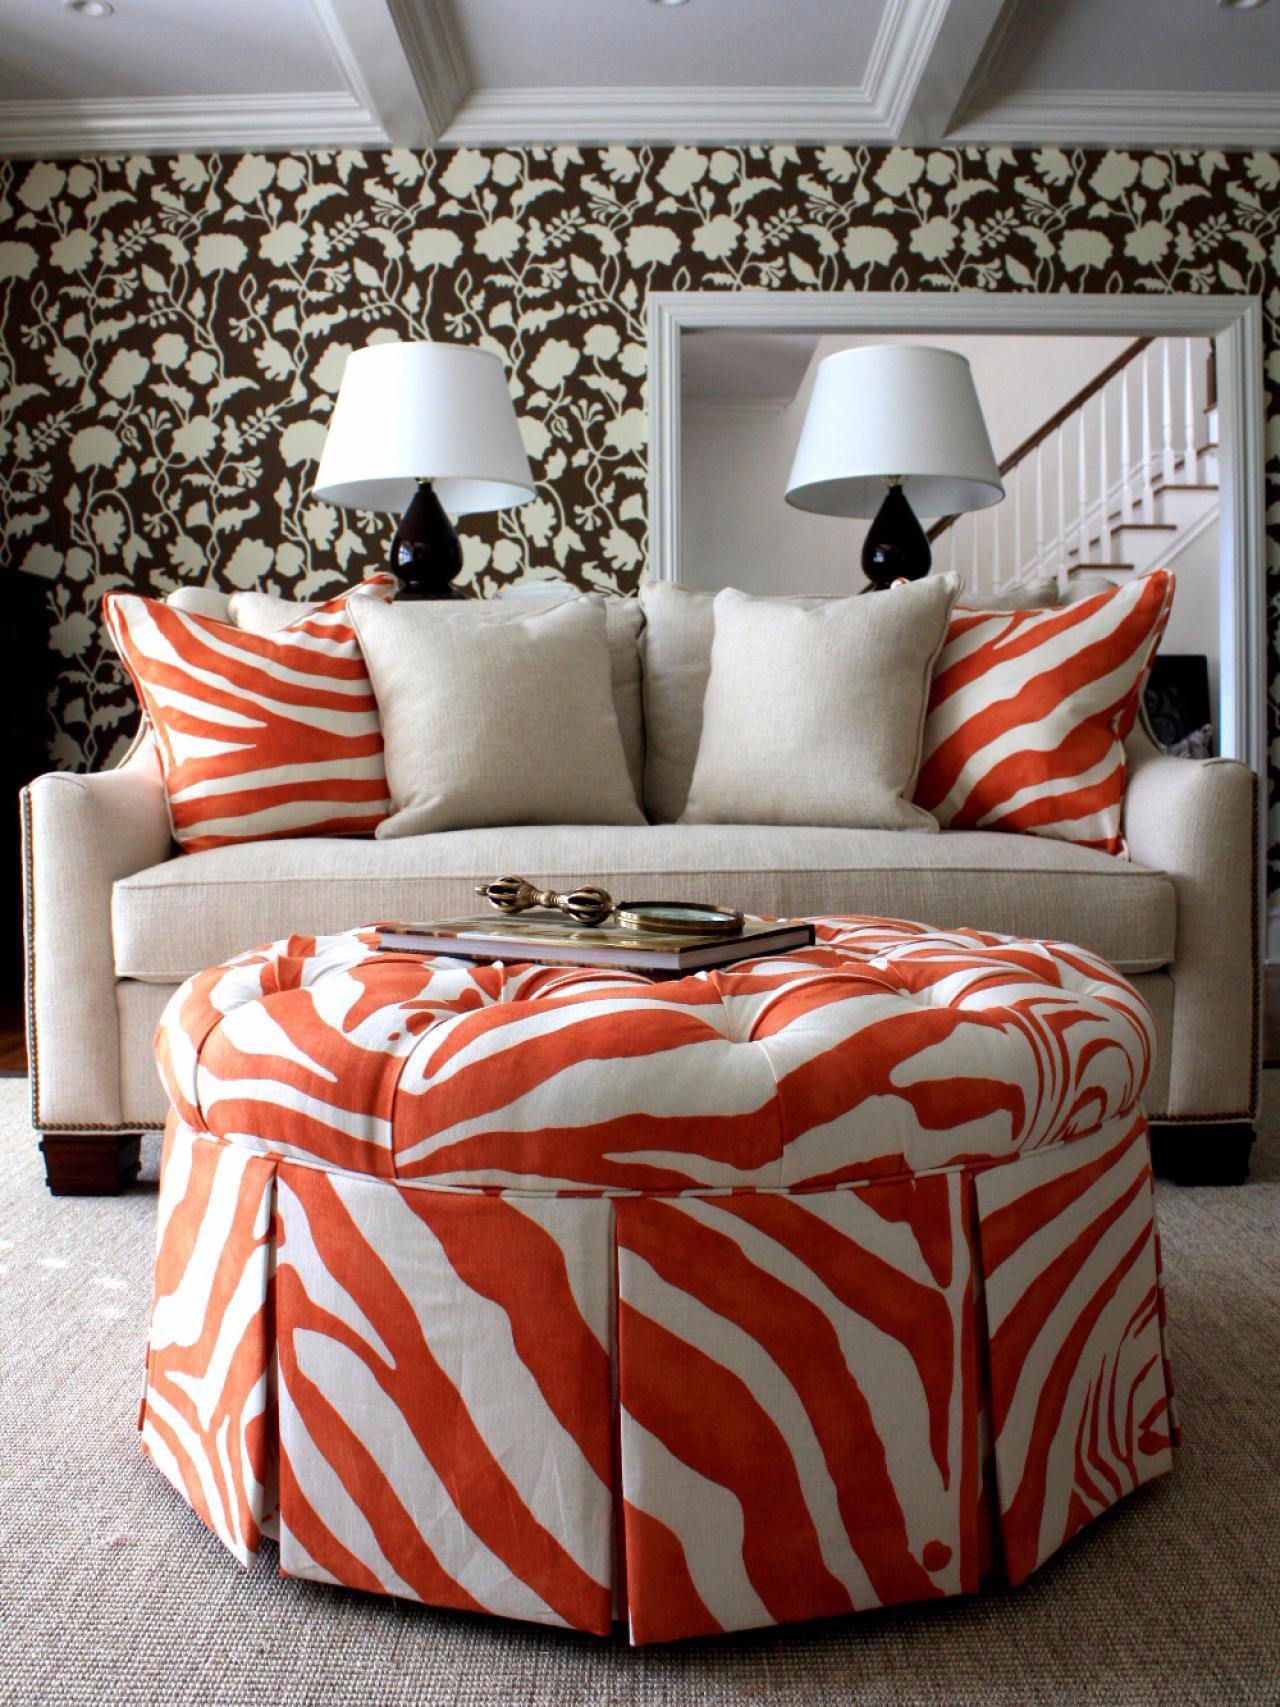 Original_Tangerine-Tango-Porter-Design-Company-Orange-Brown-Living-Room_s3x4.jpg.rend.hgtvcom.1280.1707